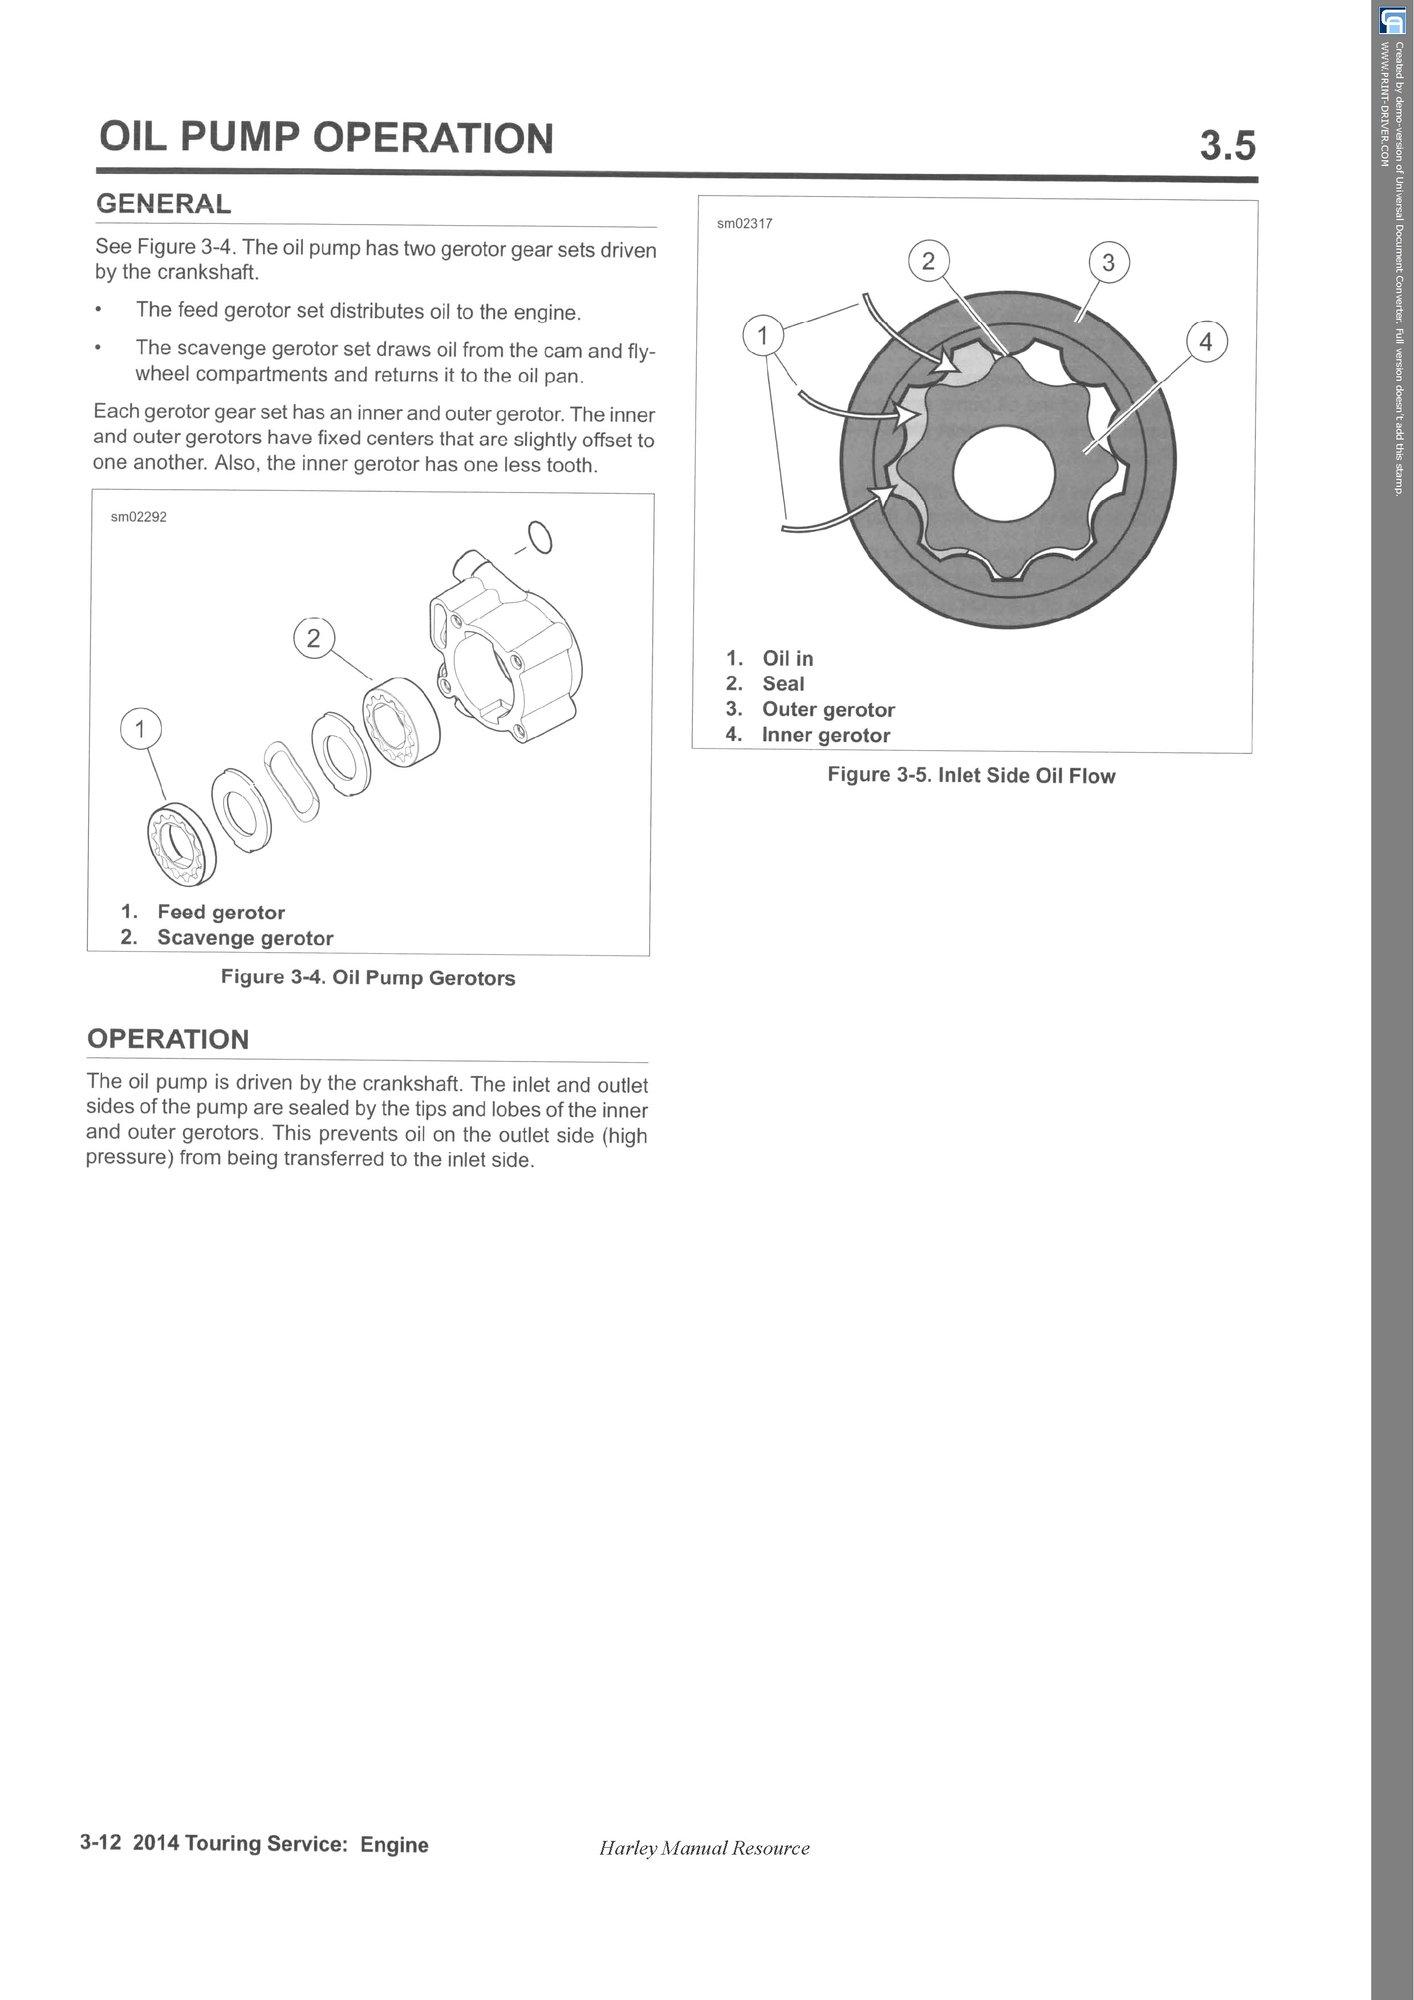 WRG-4948] Harley Davidson Engine Oil Pan Diagram on